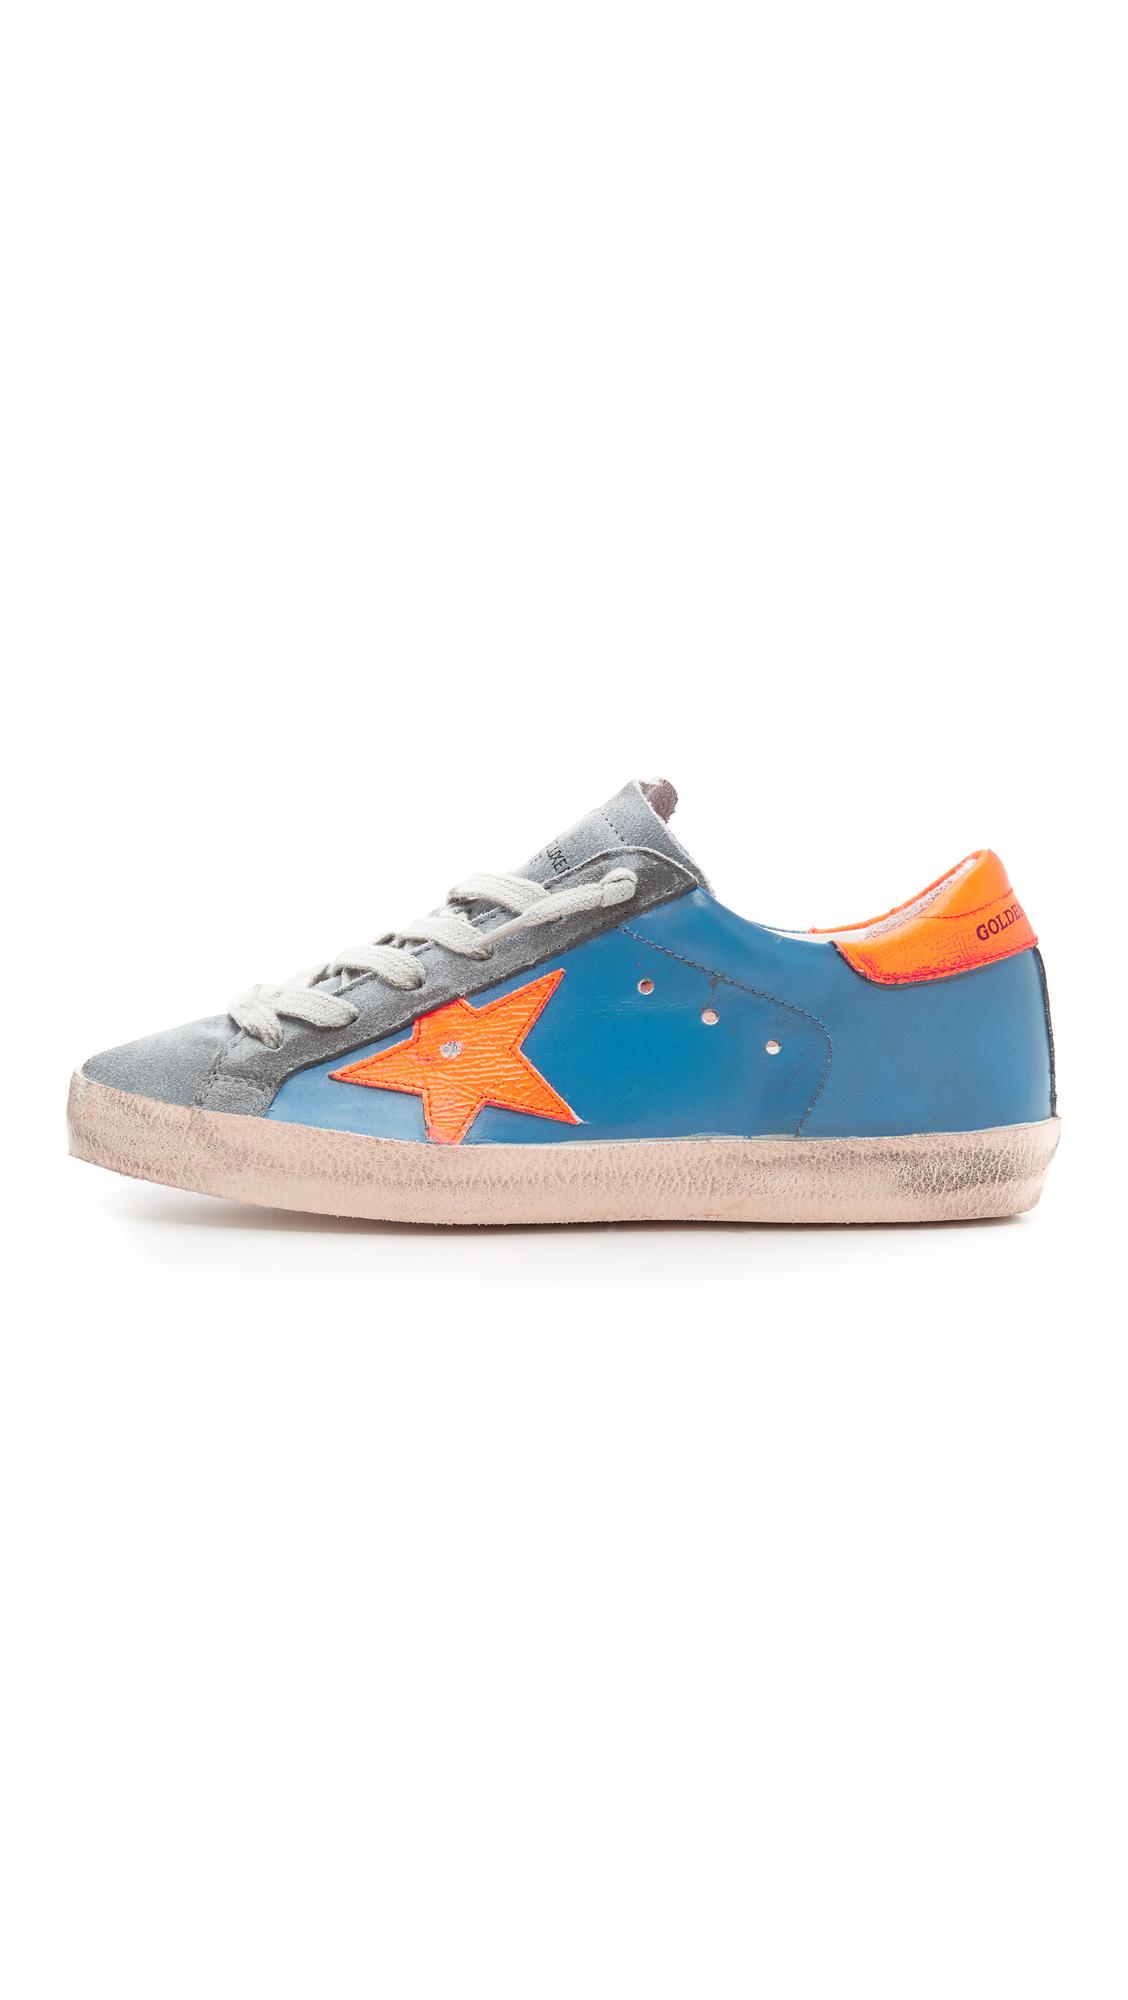 Best 25 Superstar Sneakers ideas on Pinterest Superstar shoes